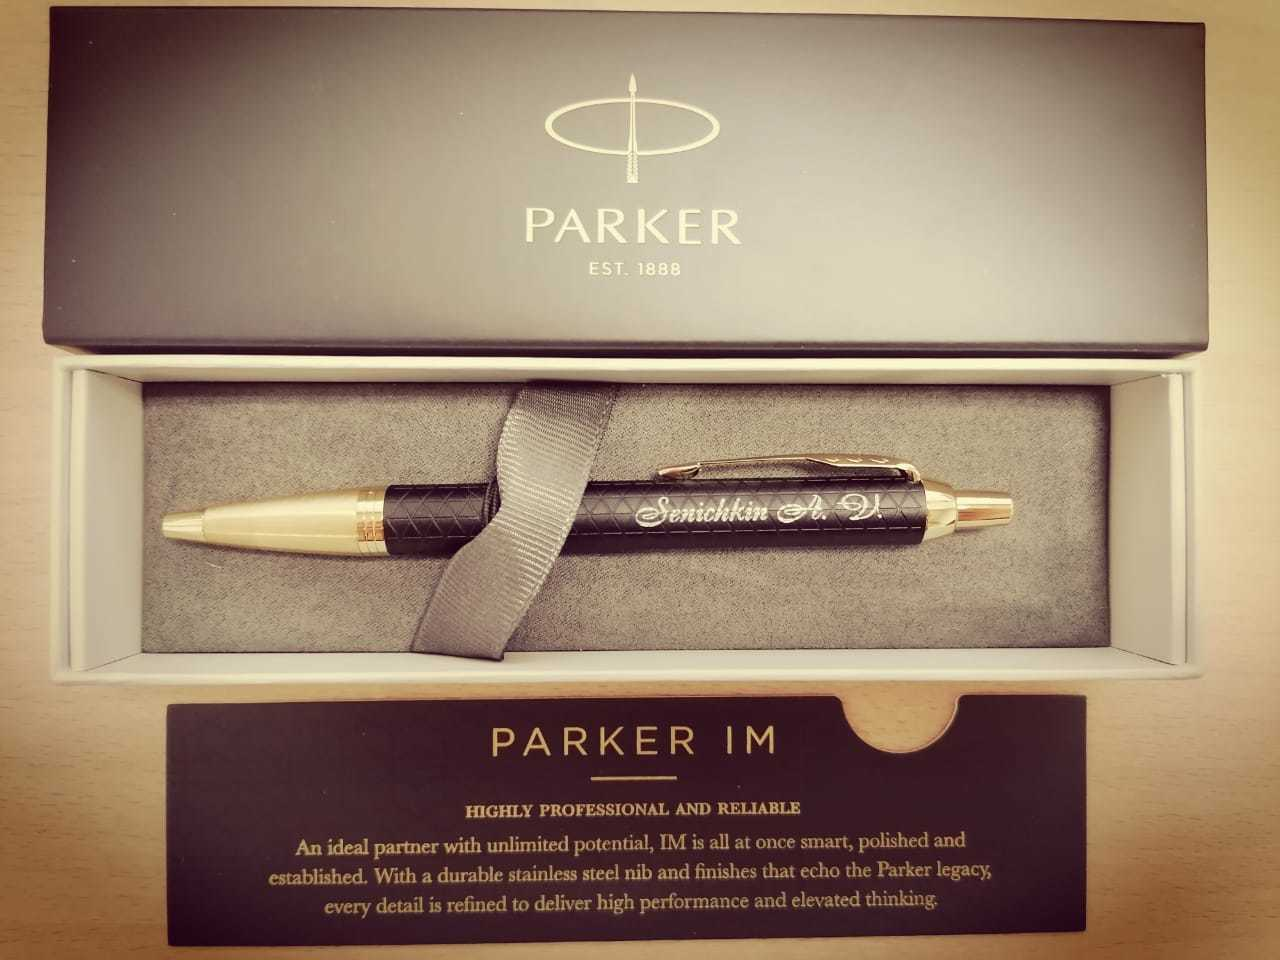 Пример № 20 (Шариковая) /  / Ручка: Parker IM / Место нанесения: № 4 / Шрифт: RoscherkDL / Артикул: 1931667